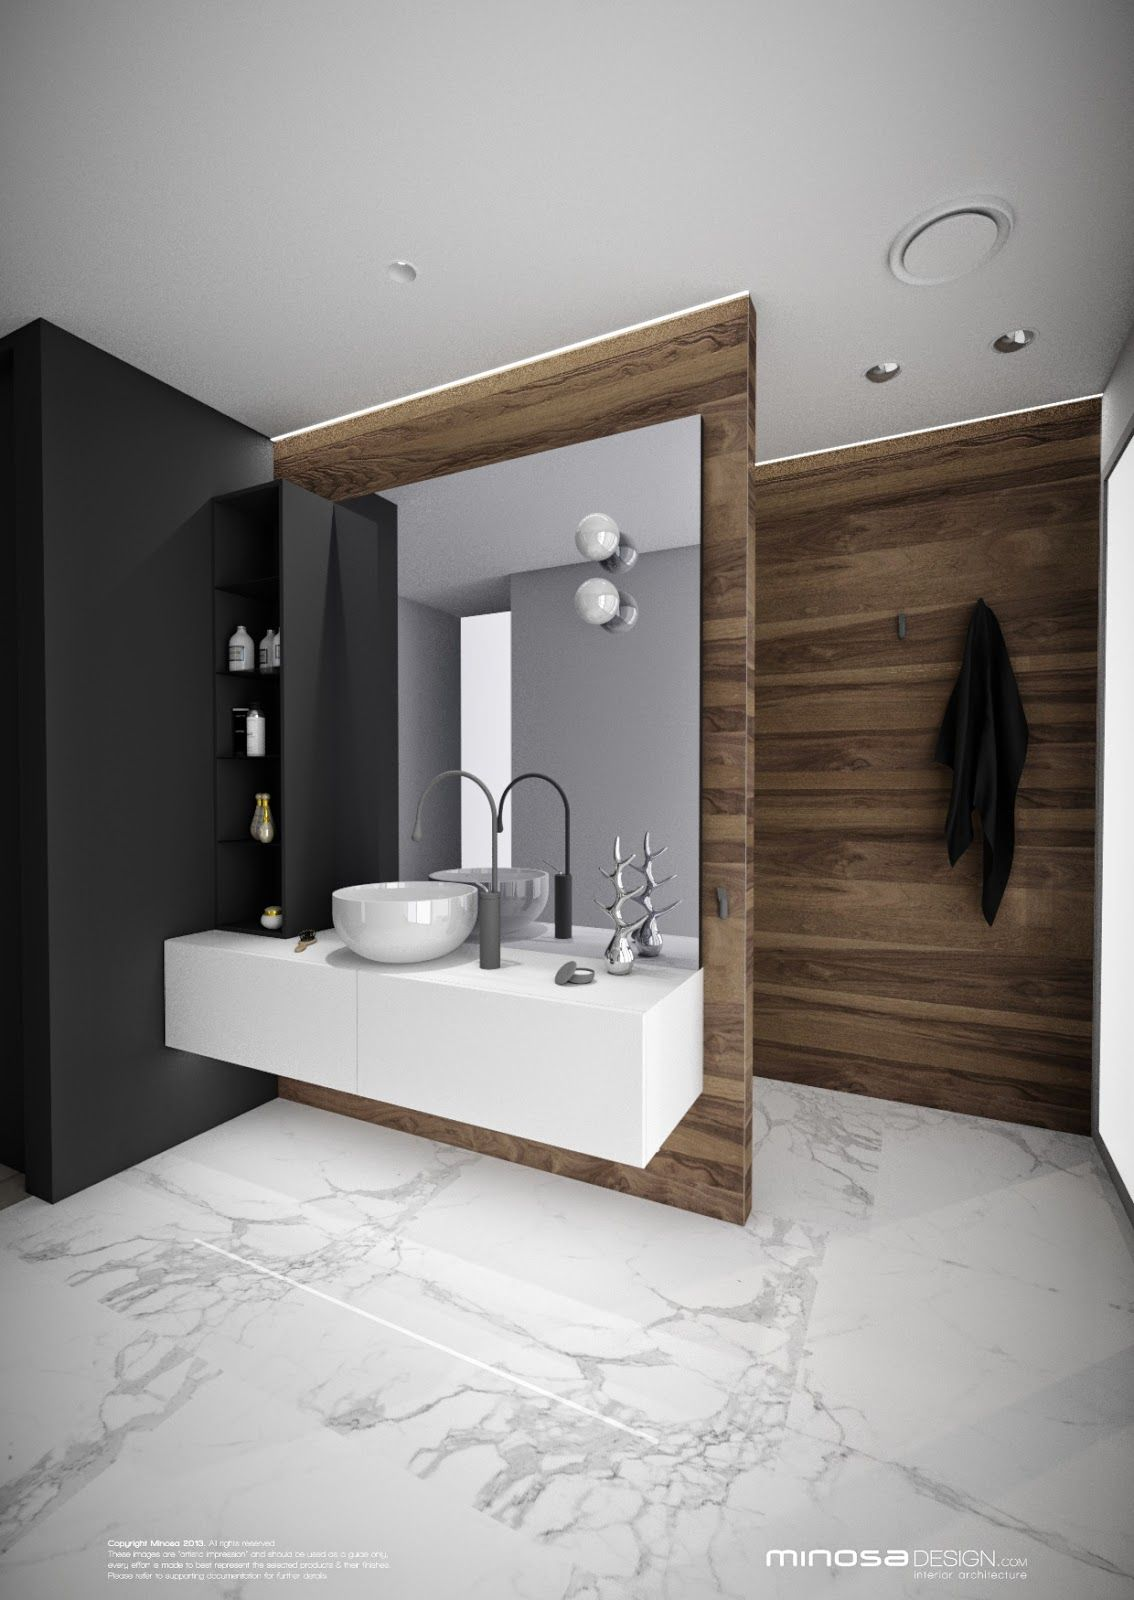 Modern Kitchen And Bathroom Design Solutions Award Winning Design Studio For The Ki Bathroom Renovation Designs Modern Bathroom Design Bathroom Interior Design